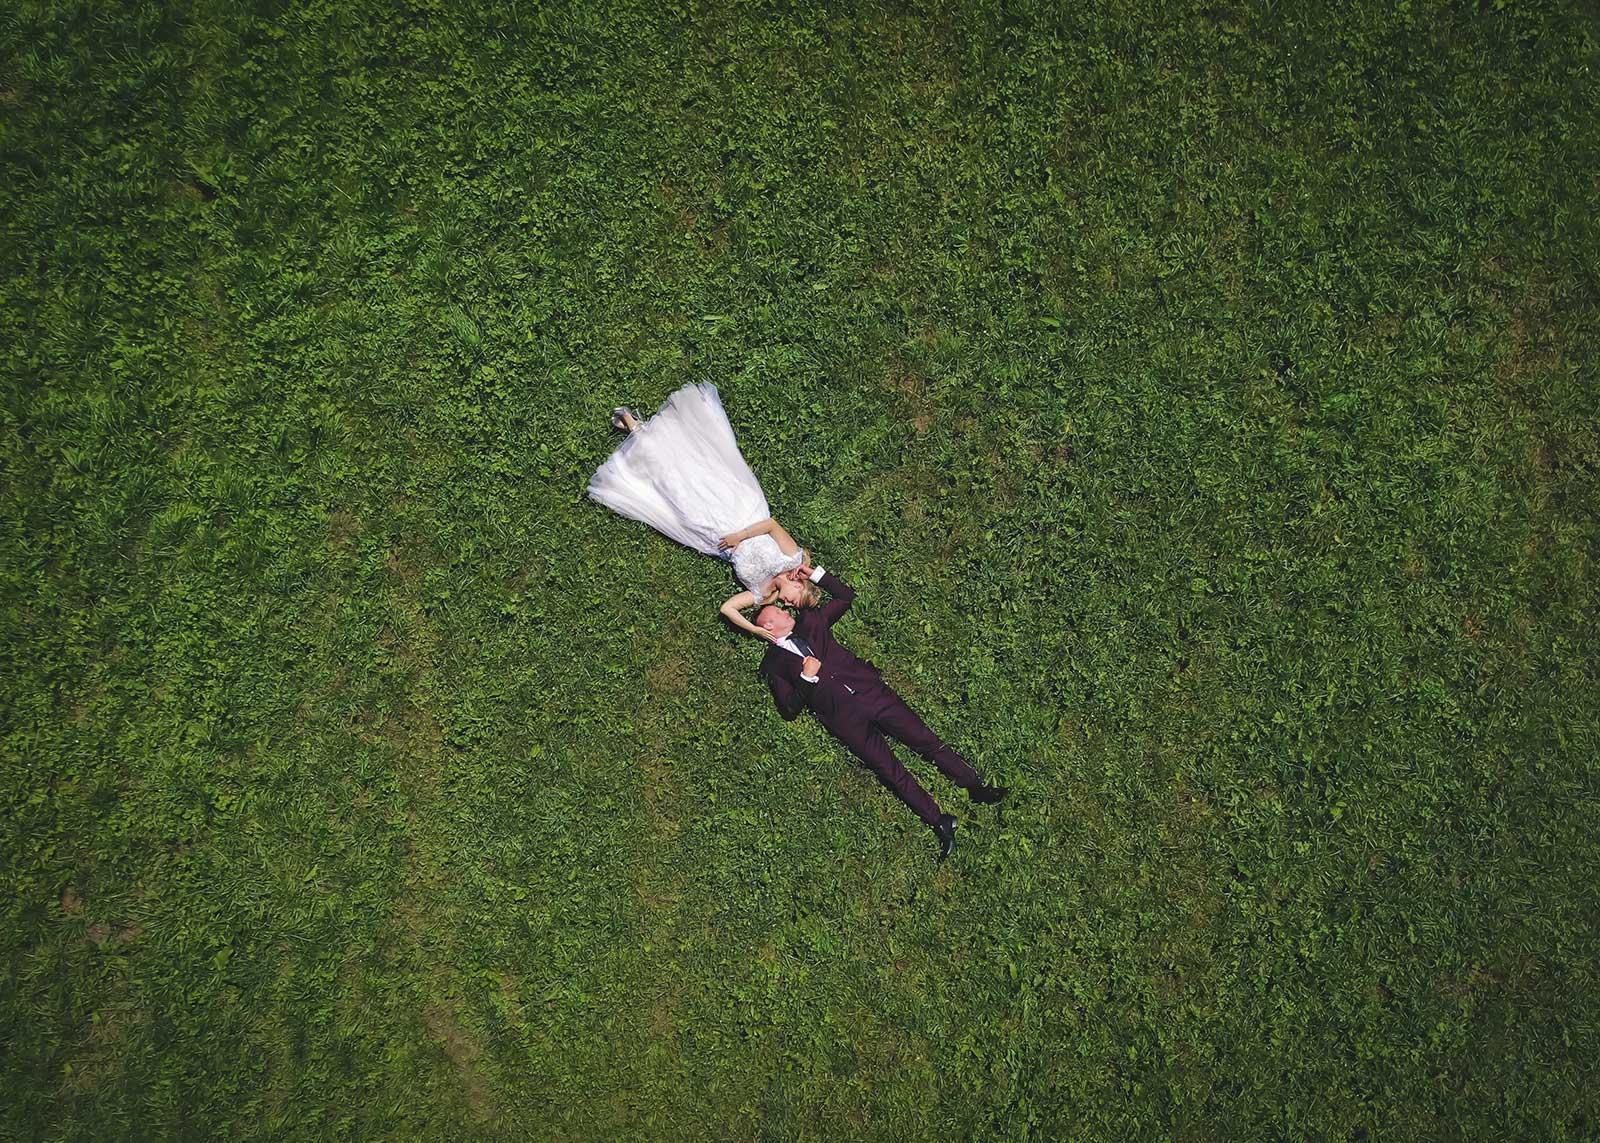 para młoda leżąca na łące z drona